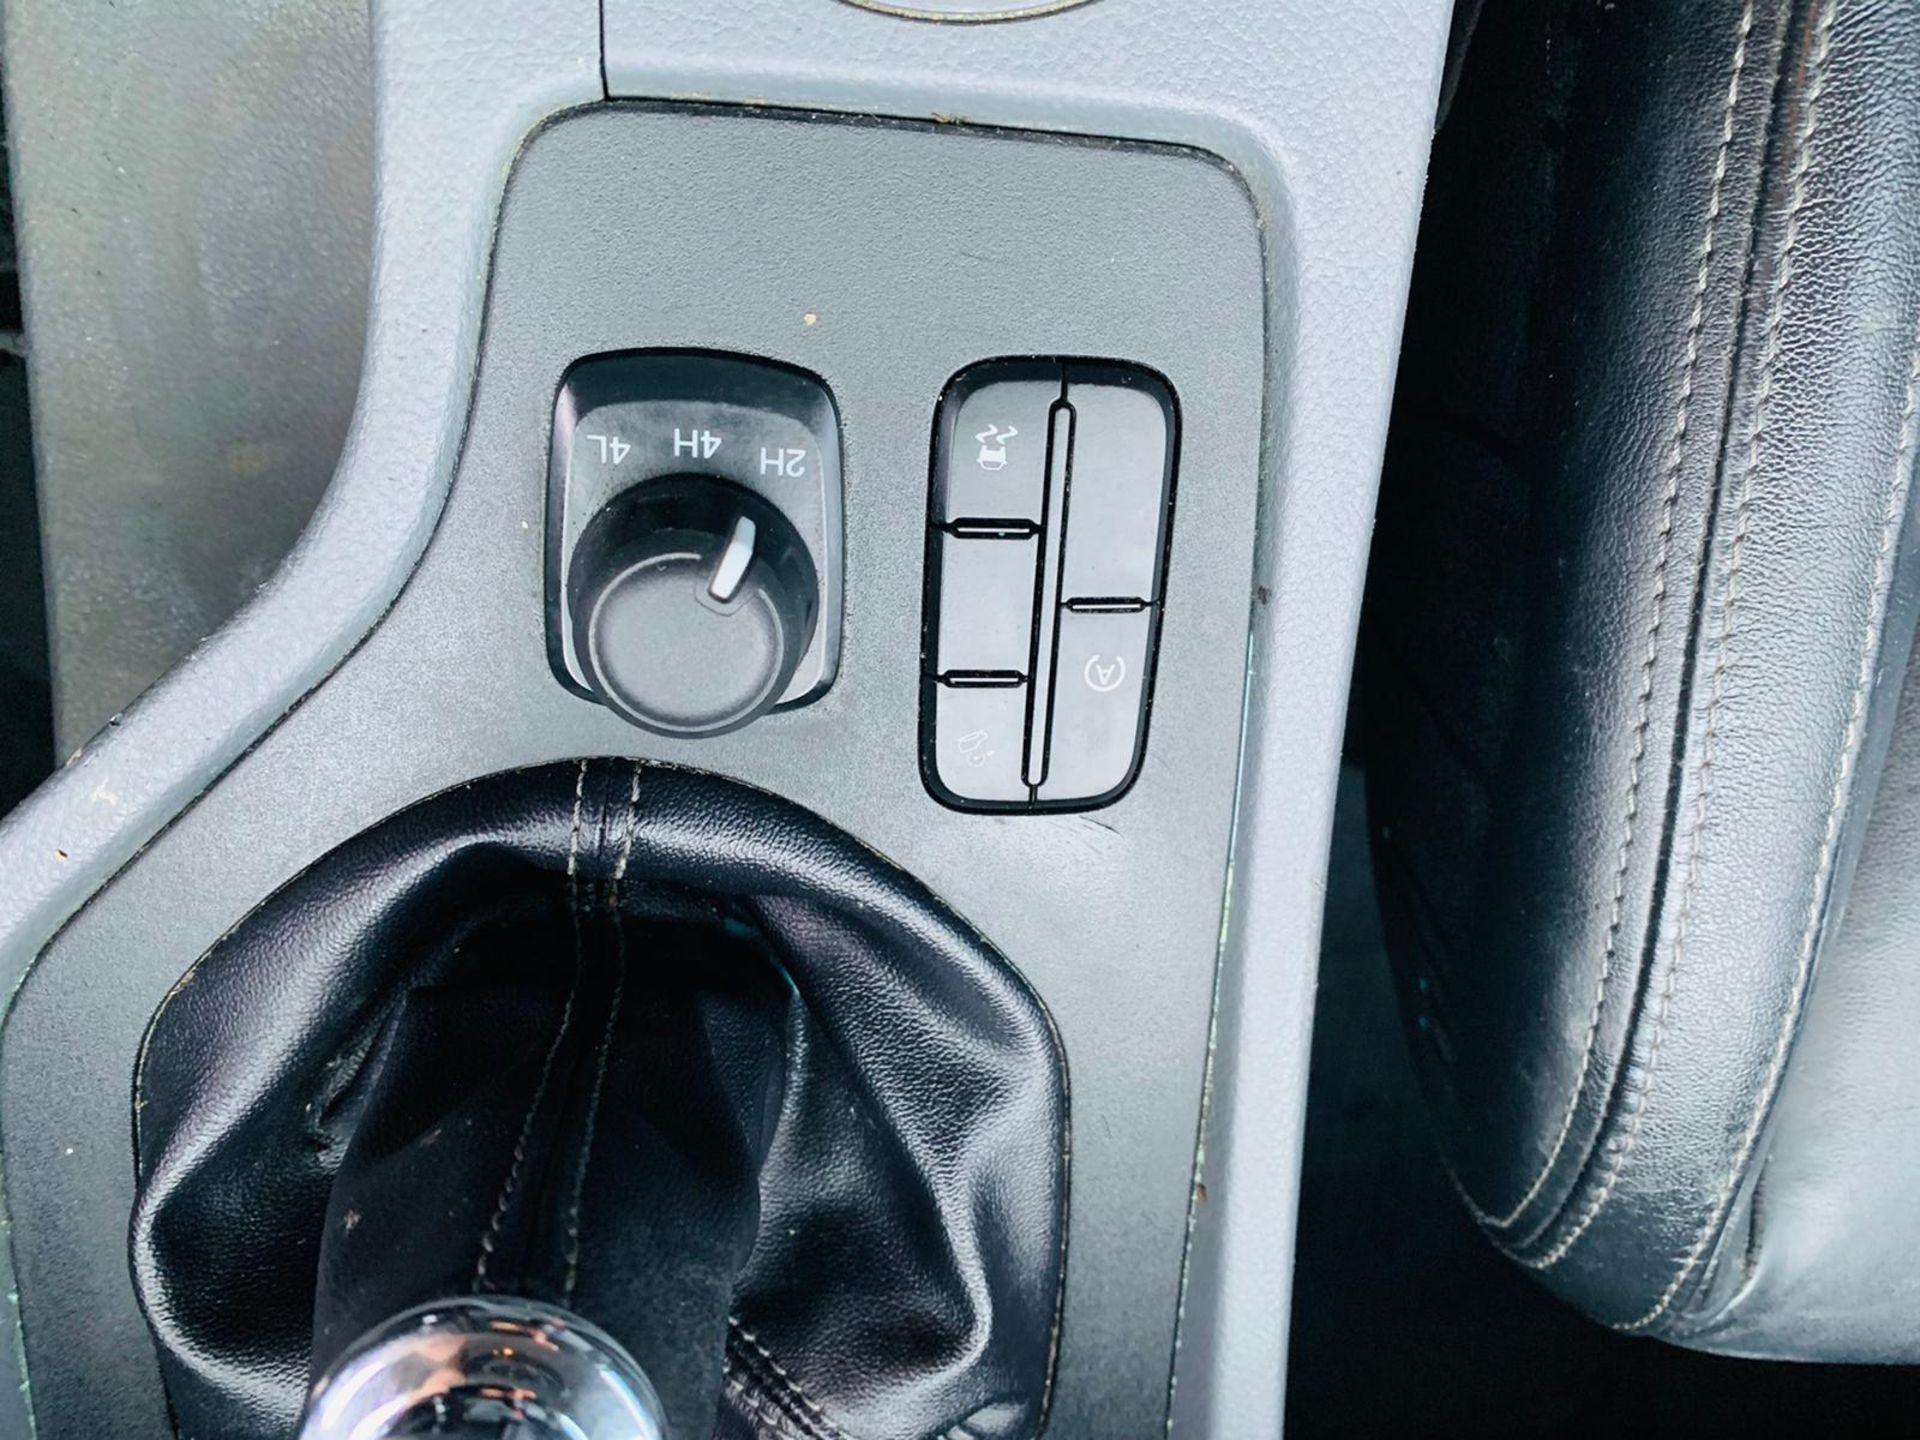 (RESERVE MET) Ford Ranger 2.2 TDCI LTD 4x4 Double Cab 2017 17 Reg - Reversing Cam -Leather - Sat Nav - Image 20 of 32